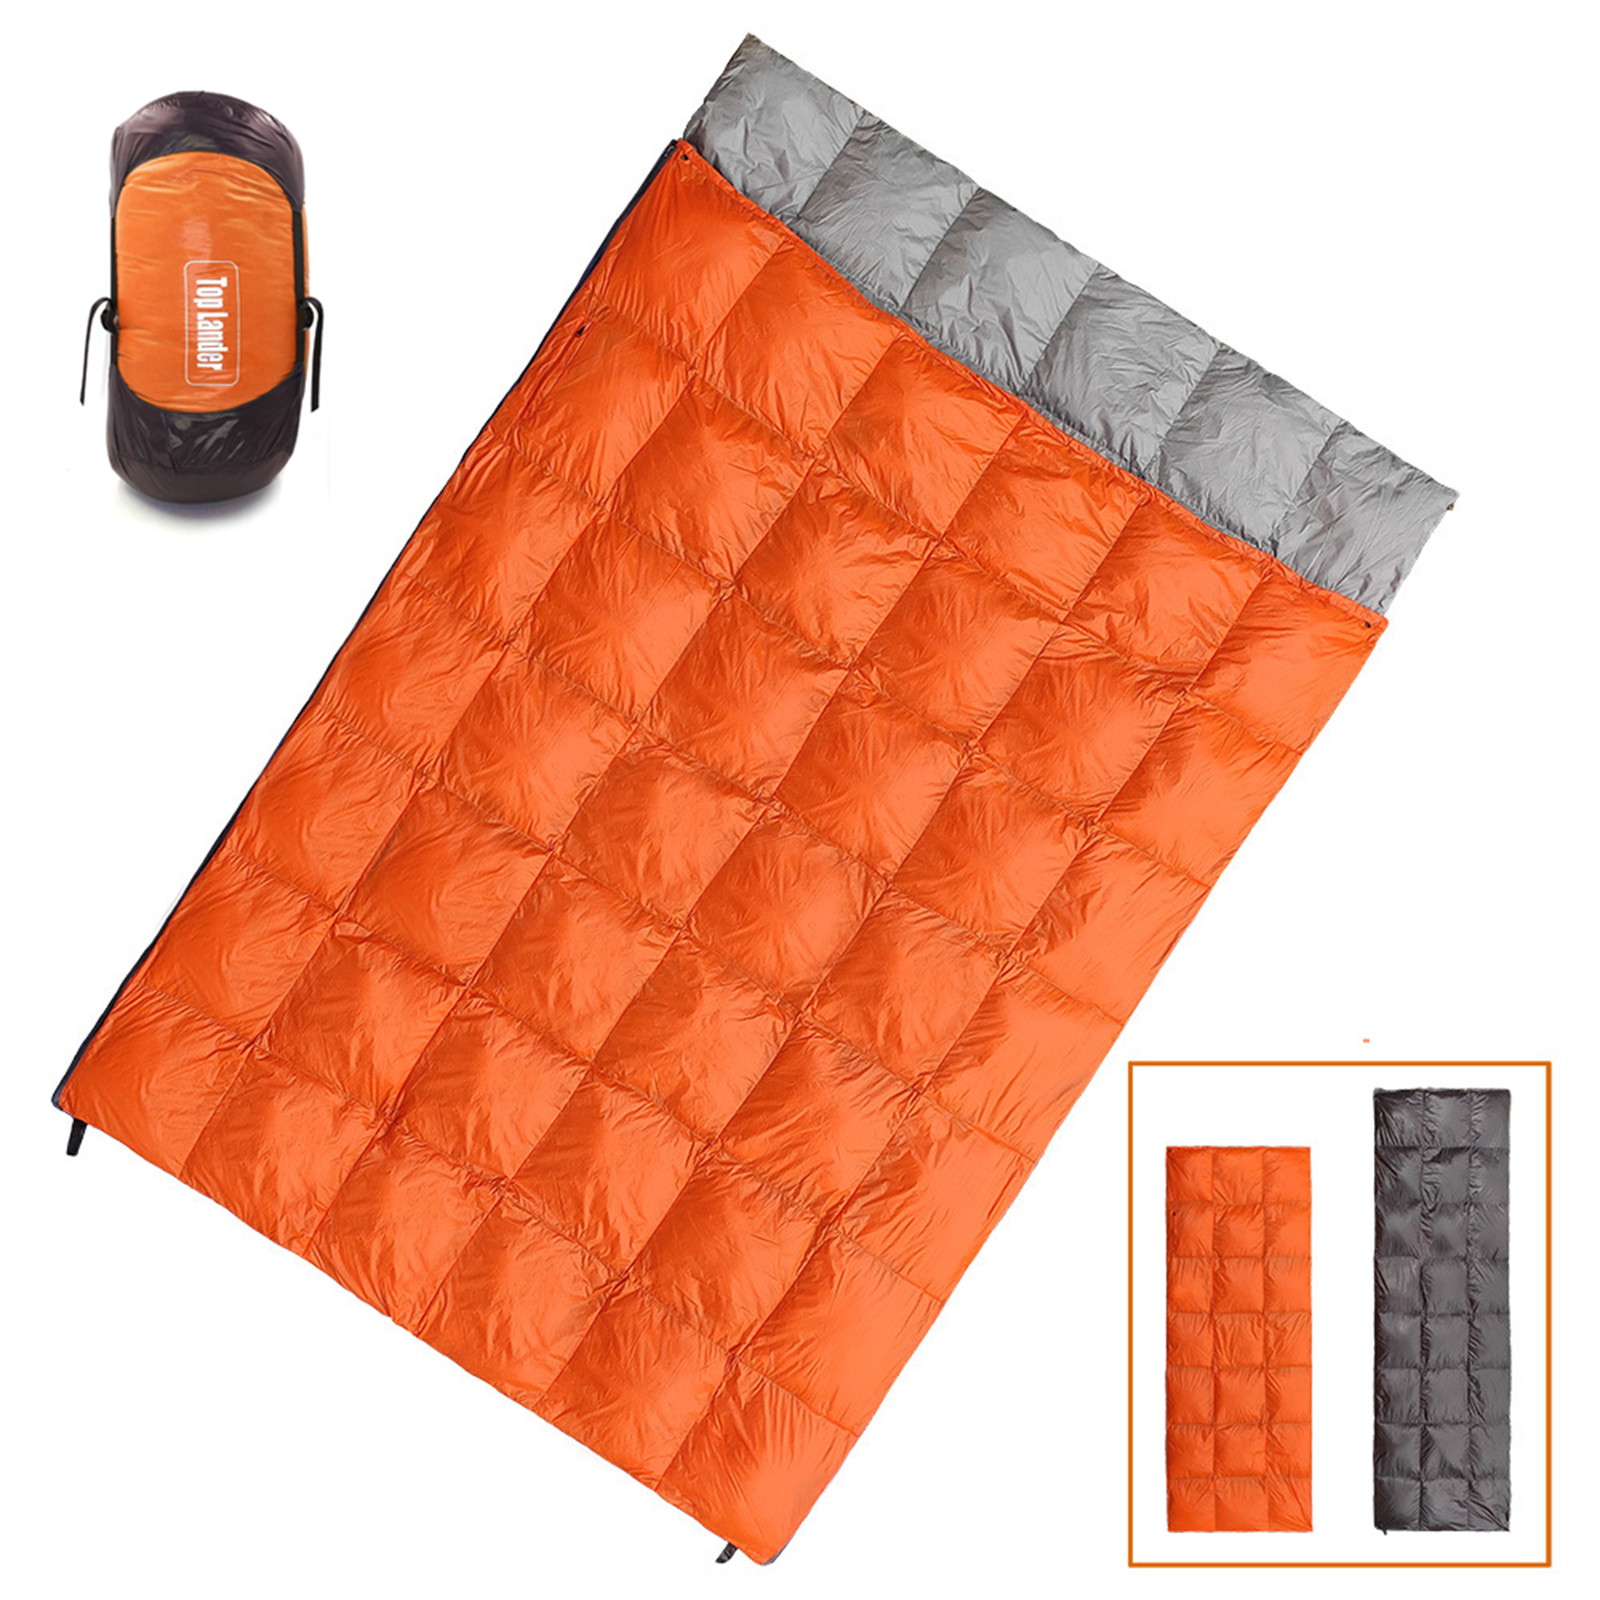 Rapture Winter Sleeping Bag Double Duck Down Ultralight Warm Compact Envelope Waterproof Sleeping Bag 2 Person Adults Indoor Outdoor Use